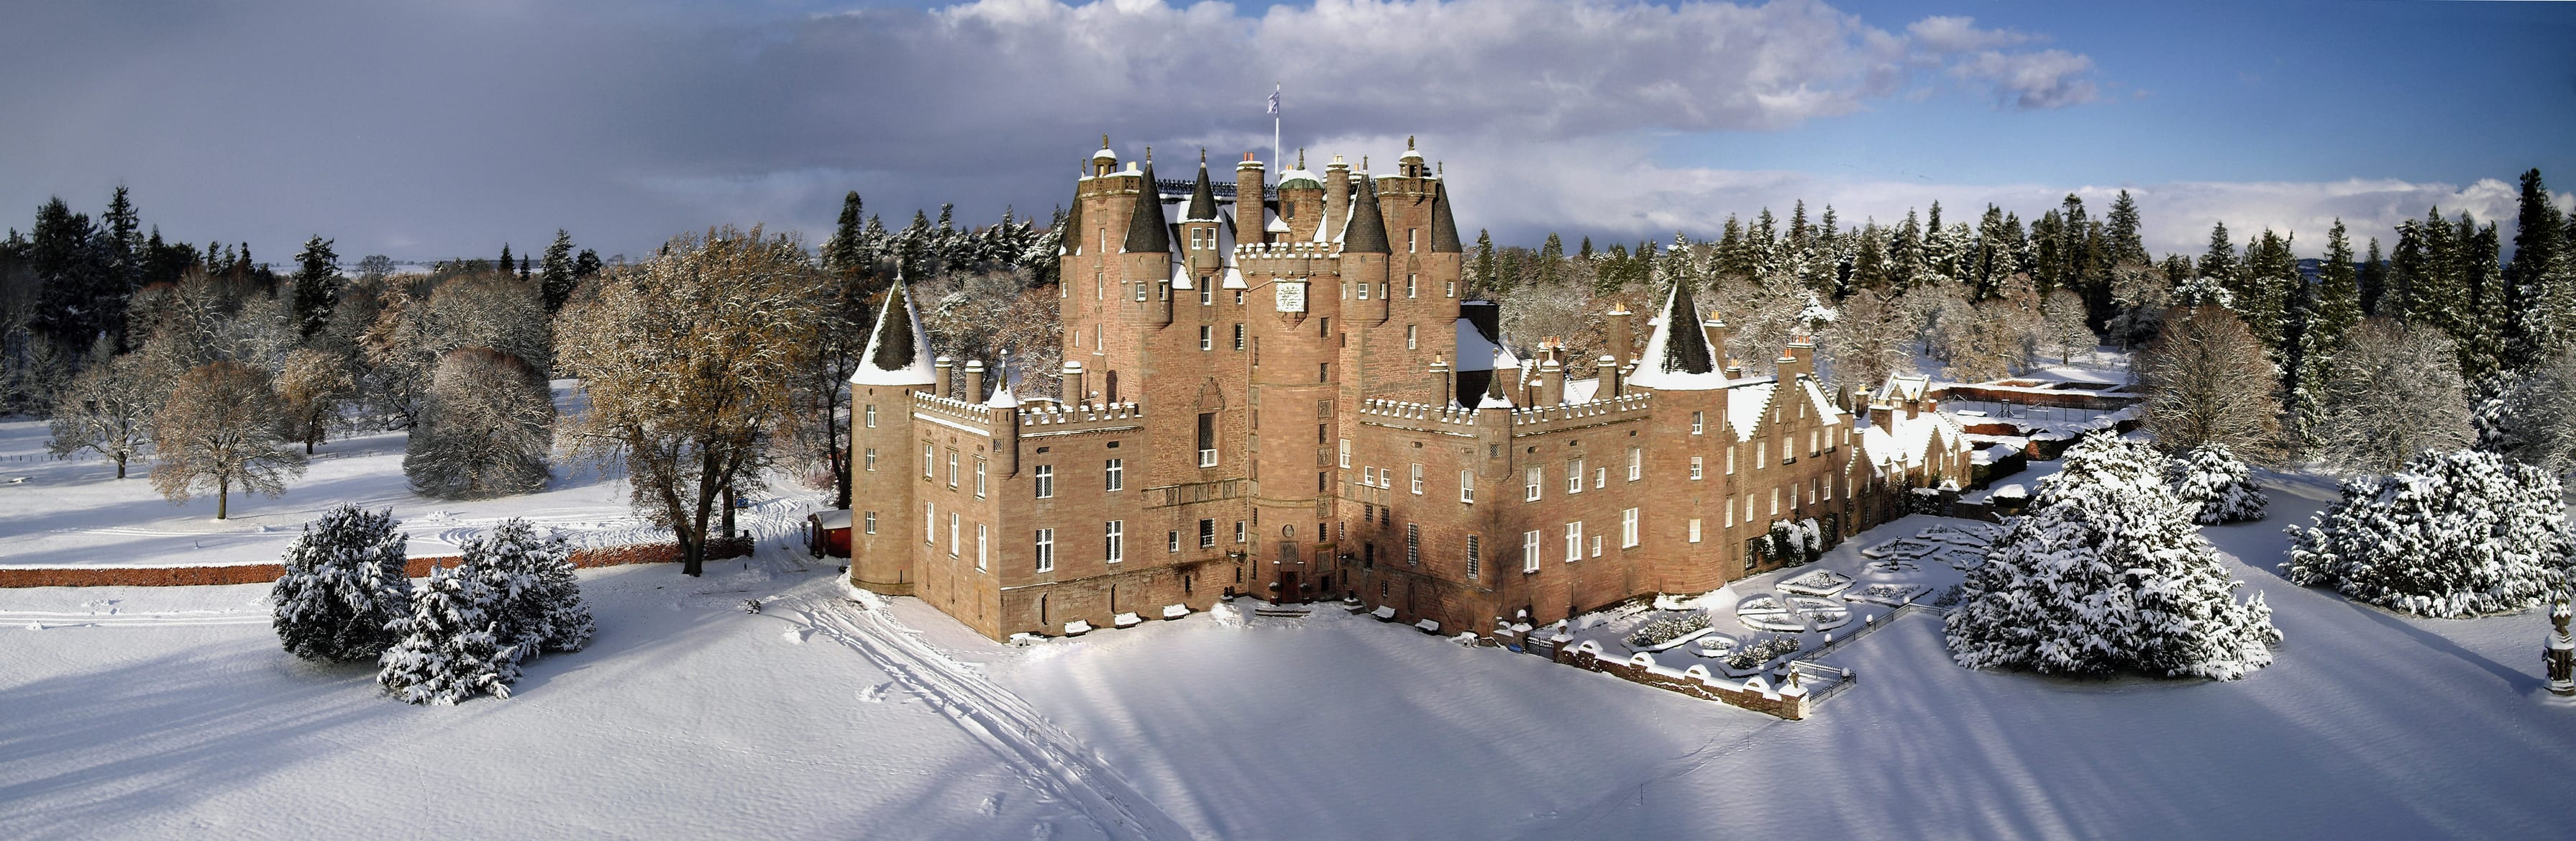 Glamis Castle in snow